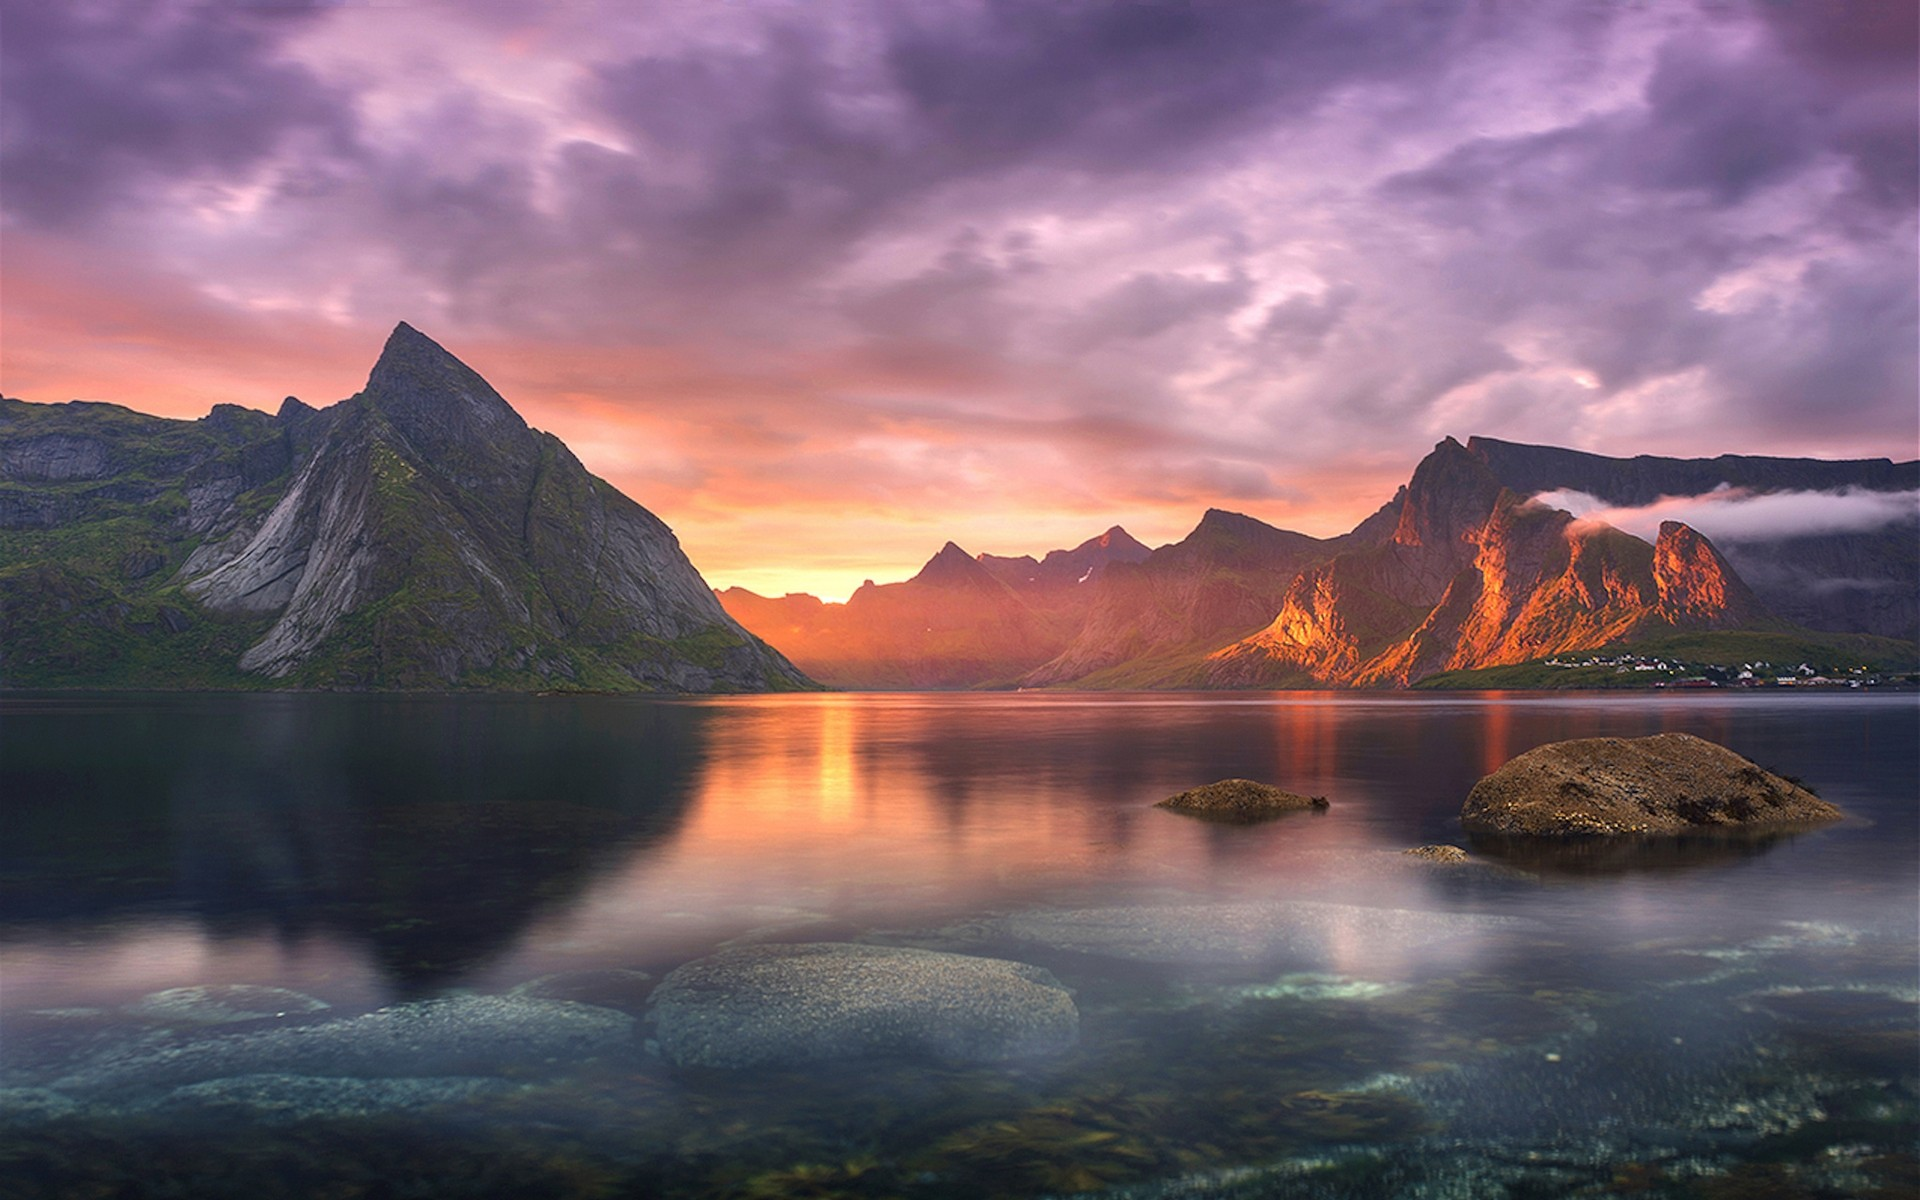 General 1920x1200 nature landscape lake sunset mountains clouds sun rays village sky sunlight Lofoten